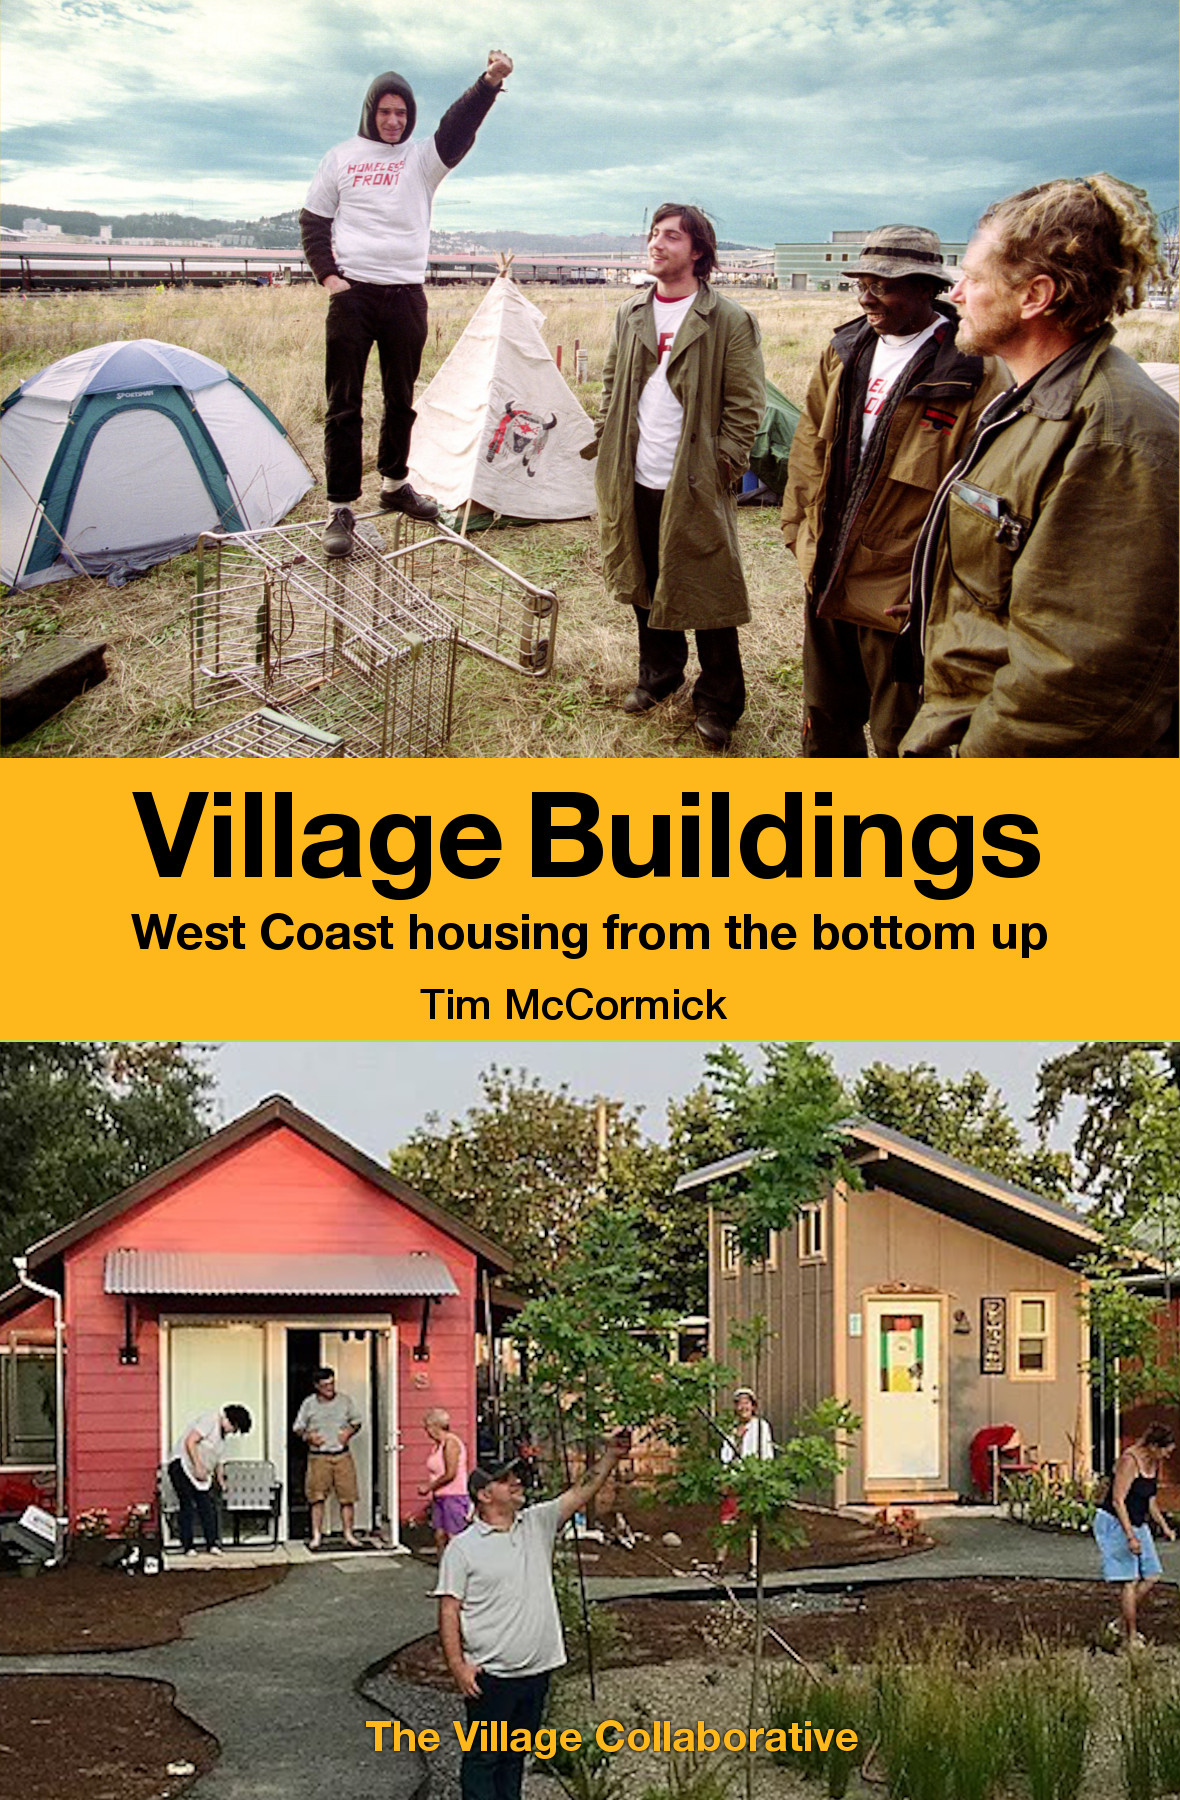 Village Building book cover mockup 3